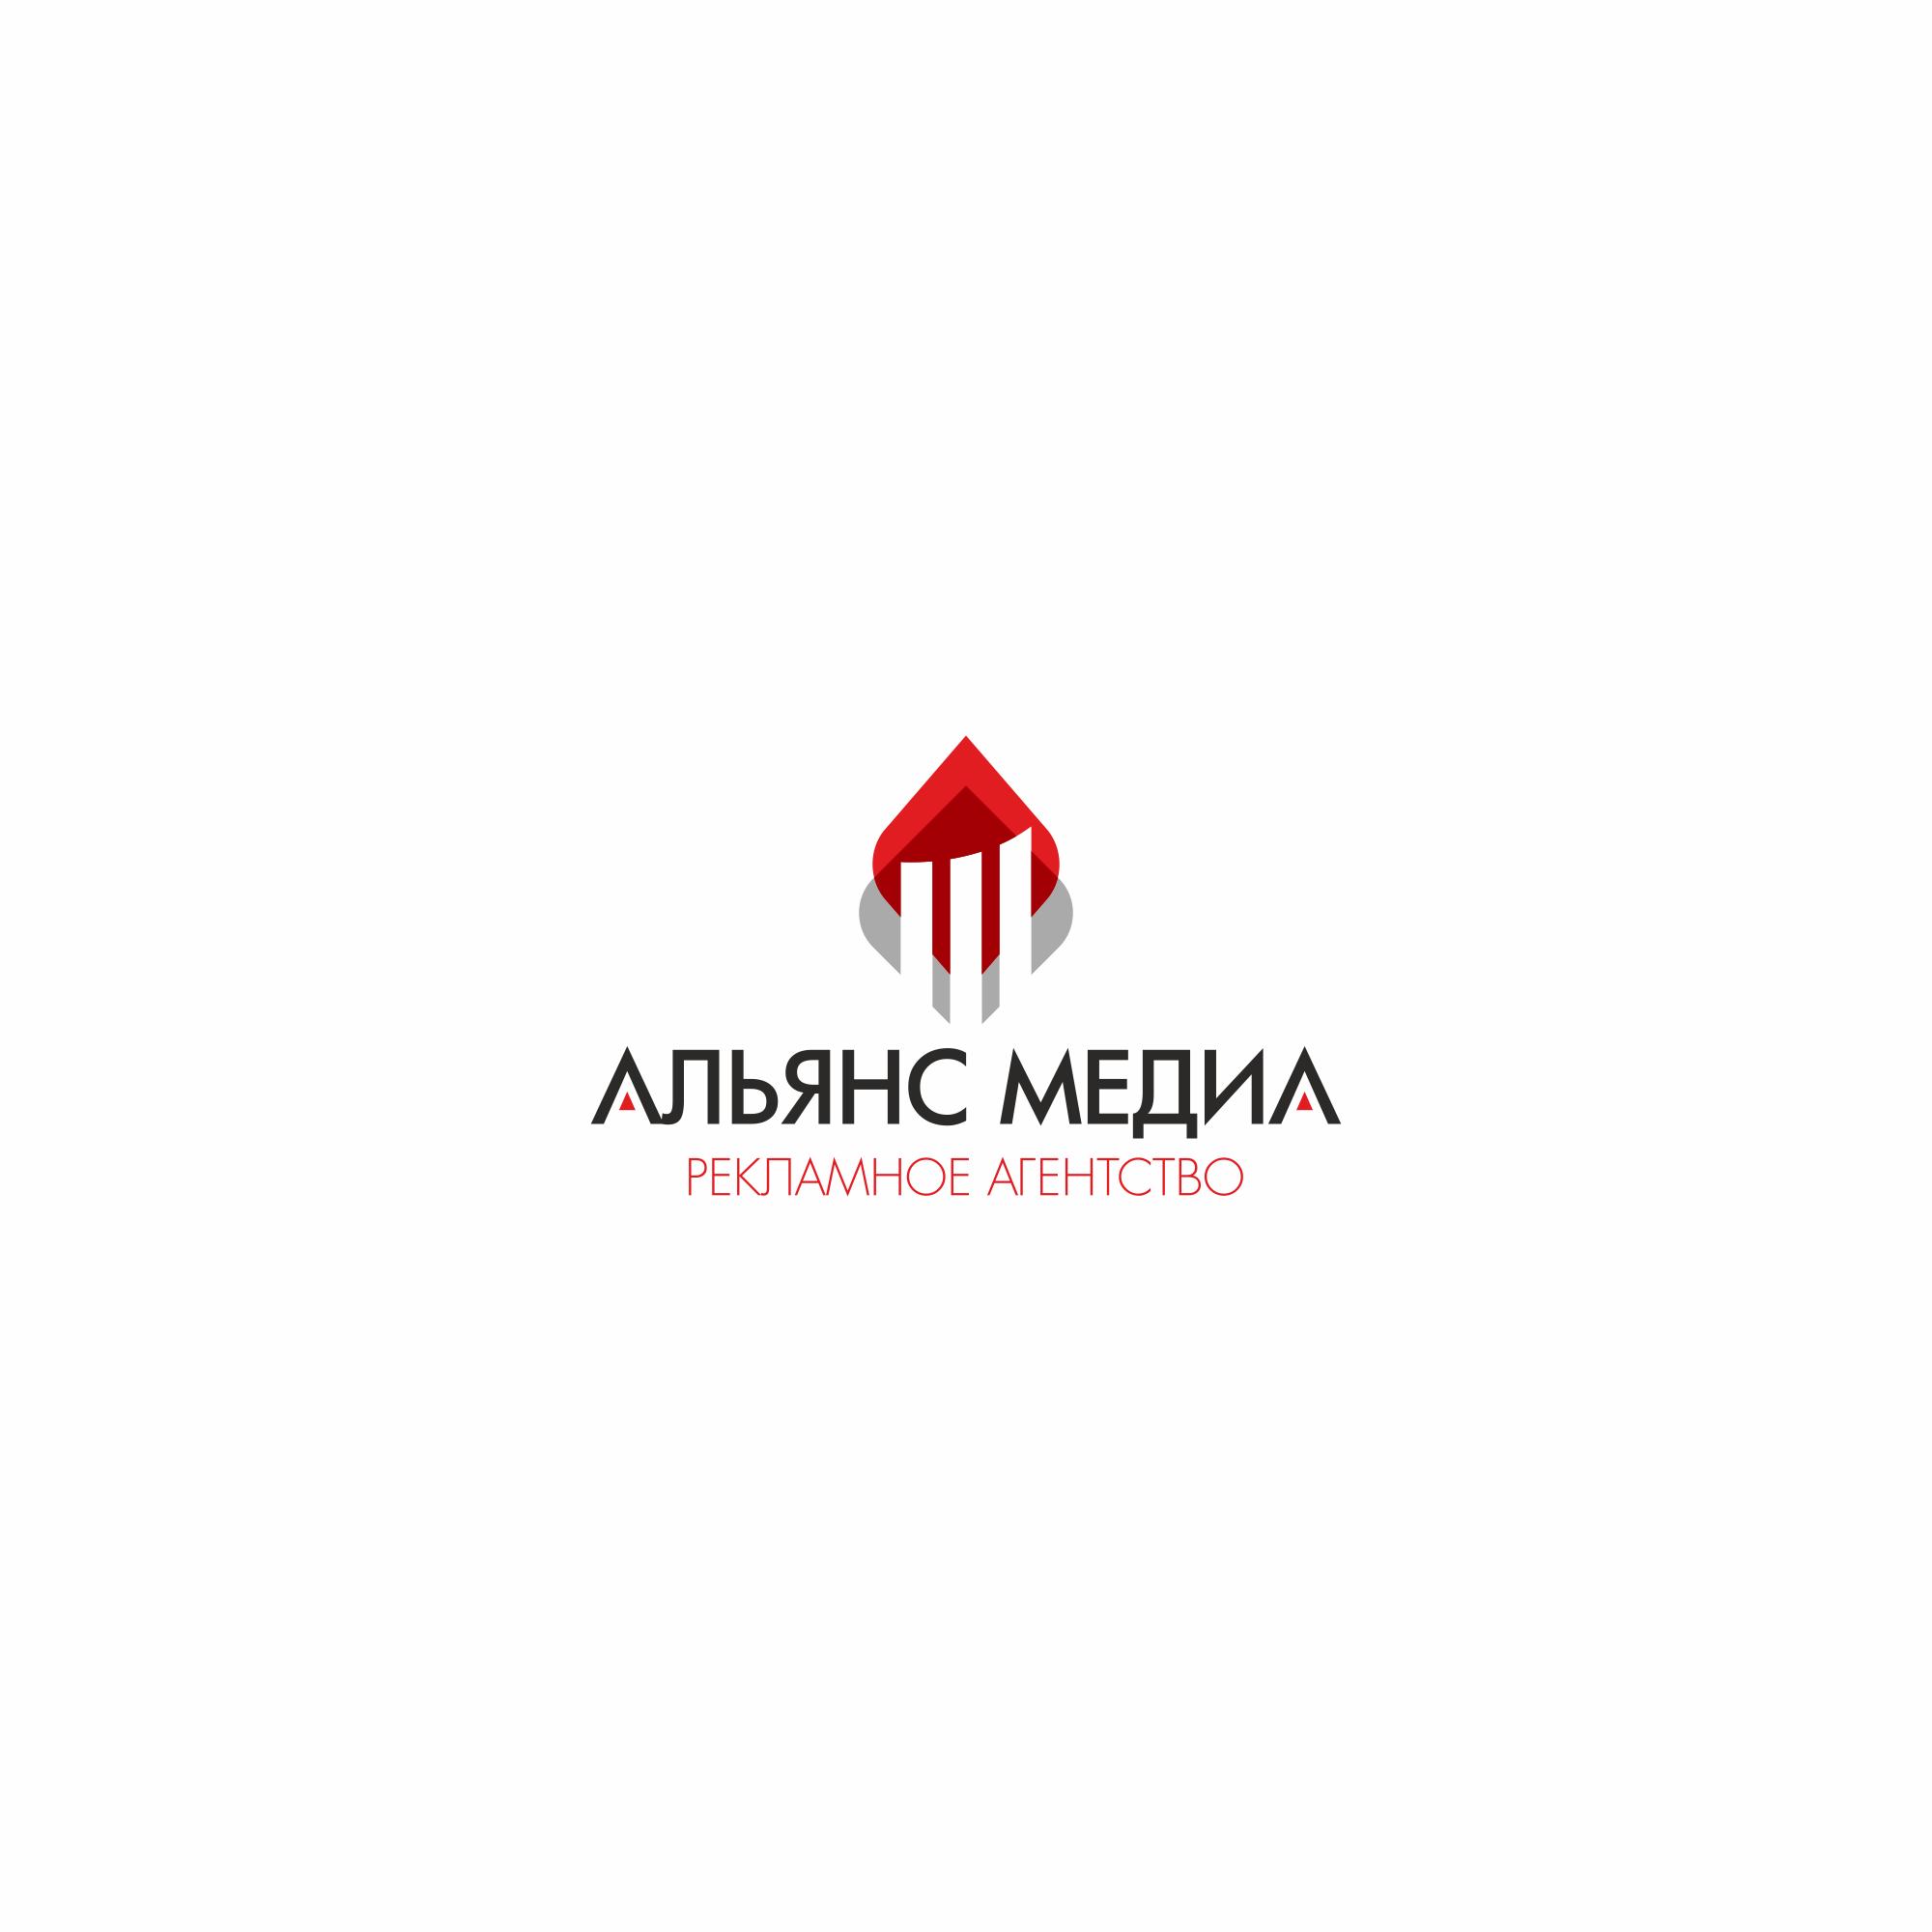 Создать логотип для компании фото f_8805ab9ff878b041.jpg